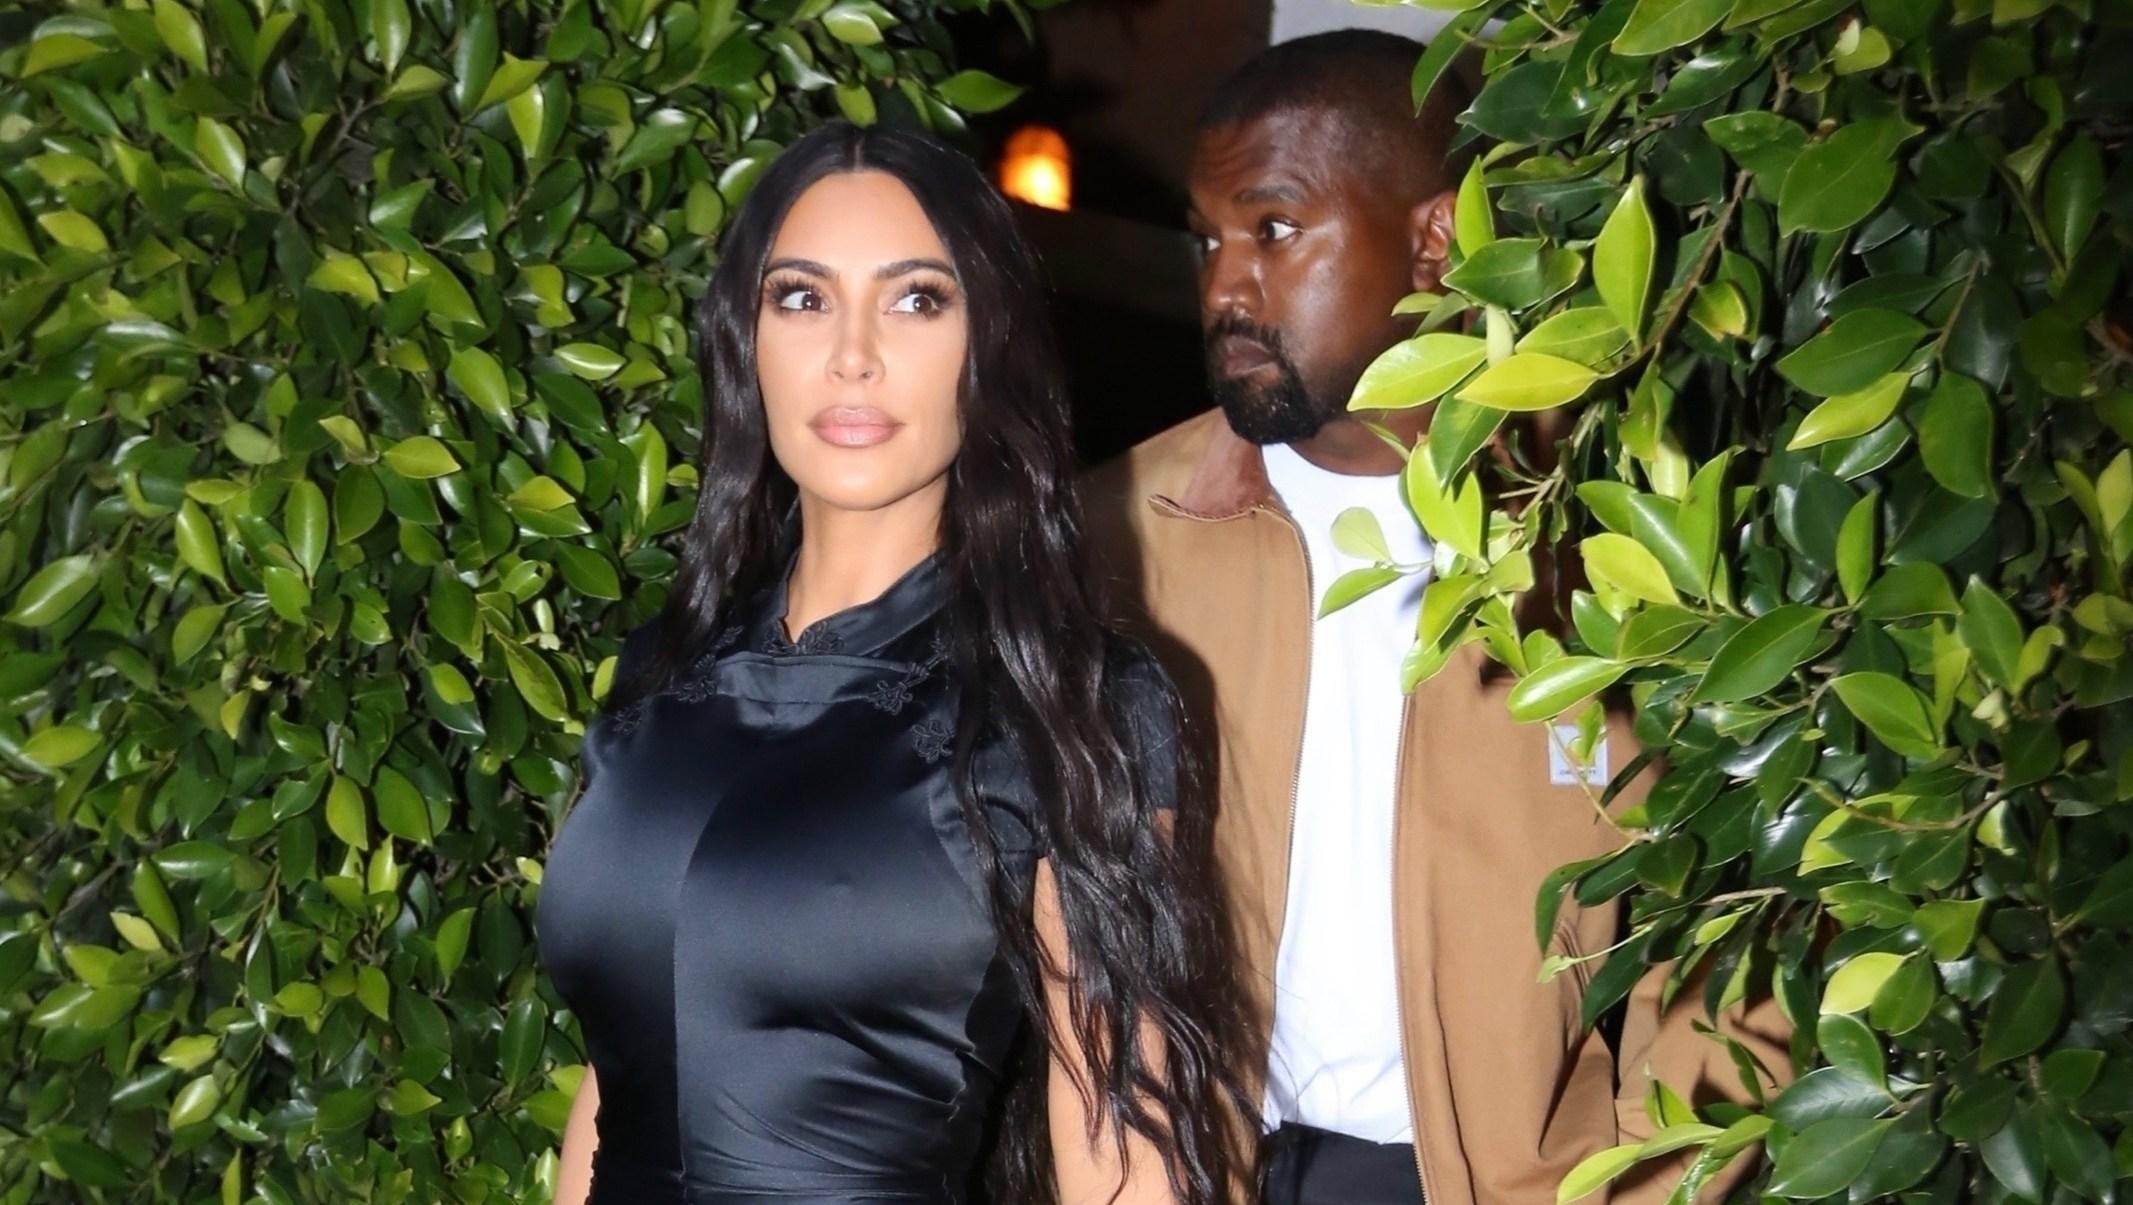 Sexy Mama! Kim Kardashian Wears a Skintight Dress While Grabbing Dinner With Kanye West